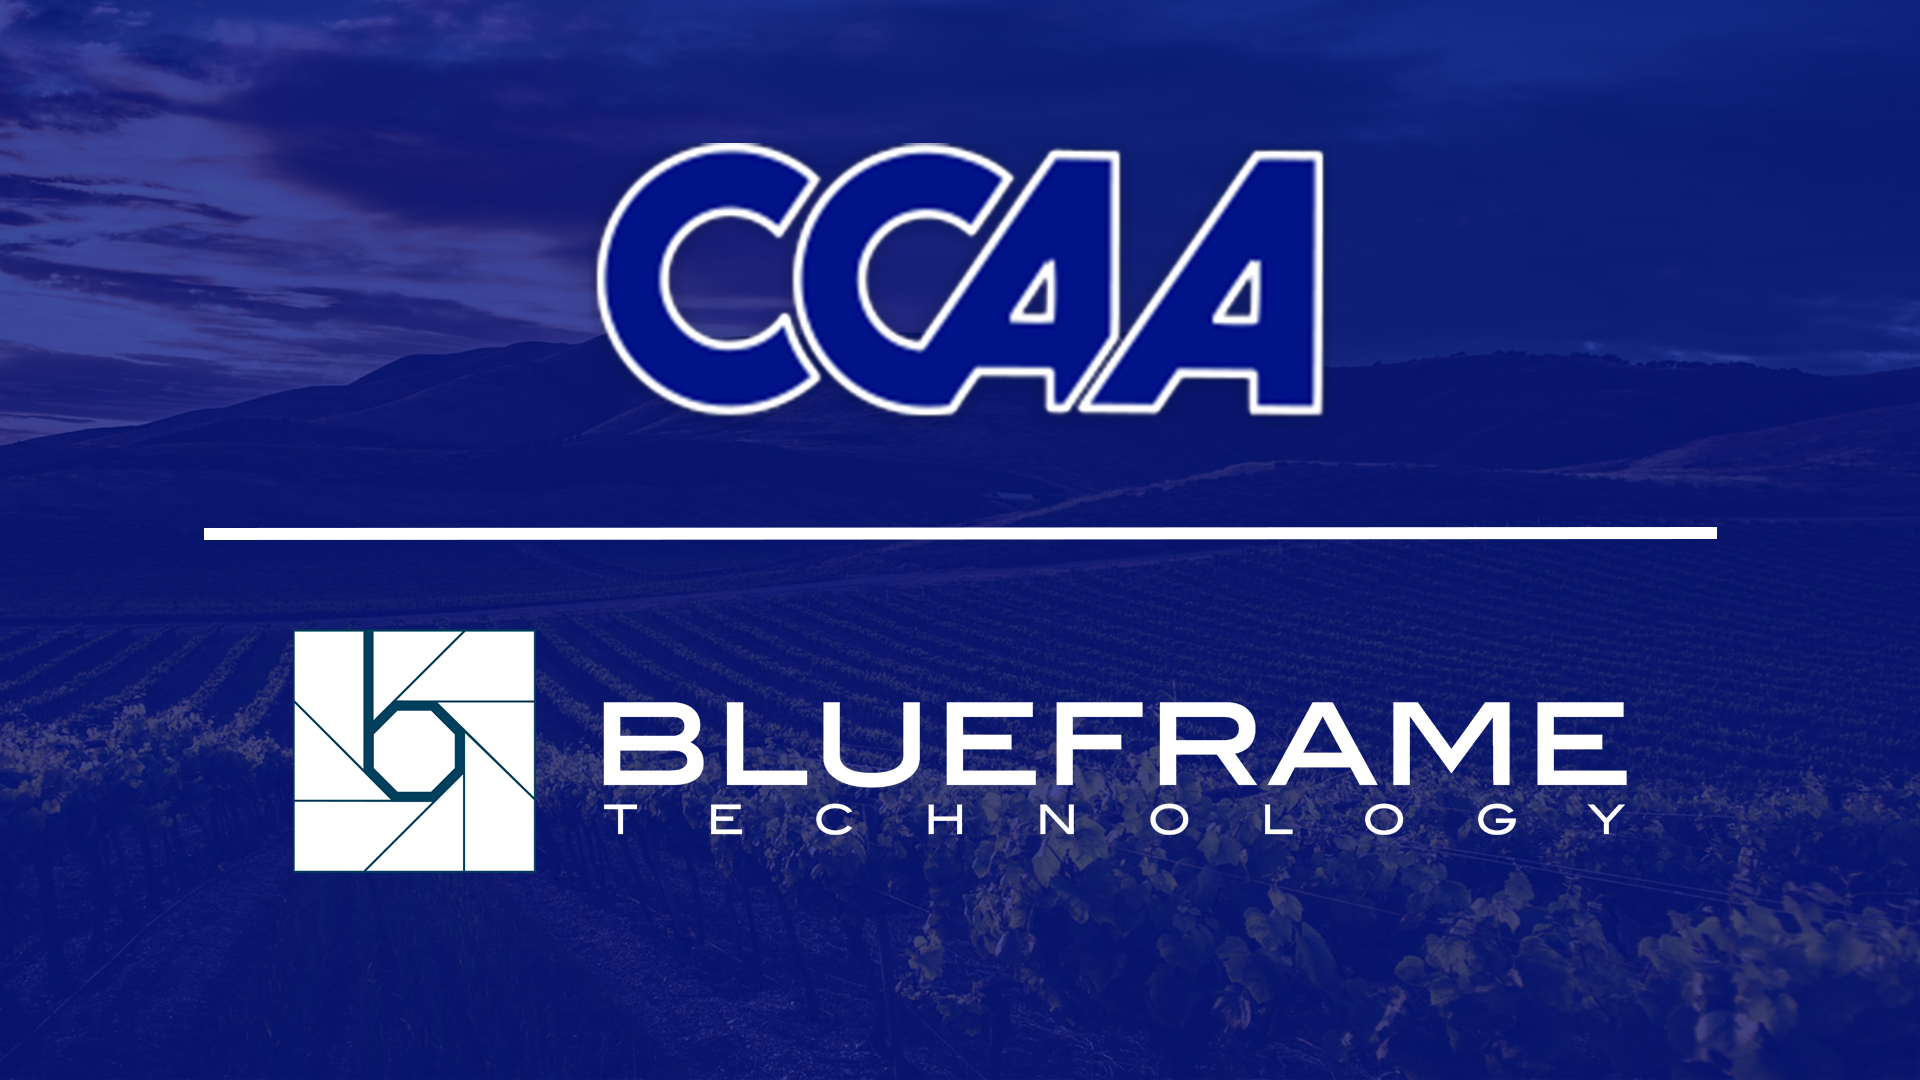 CCAA and BlueFrame